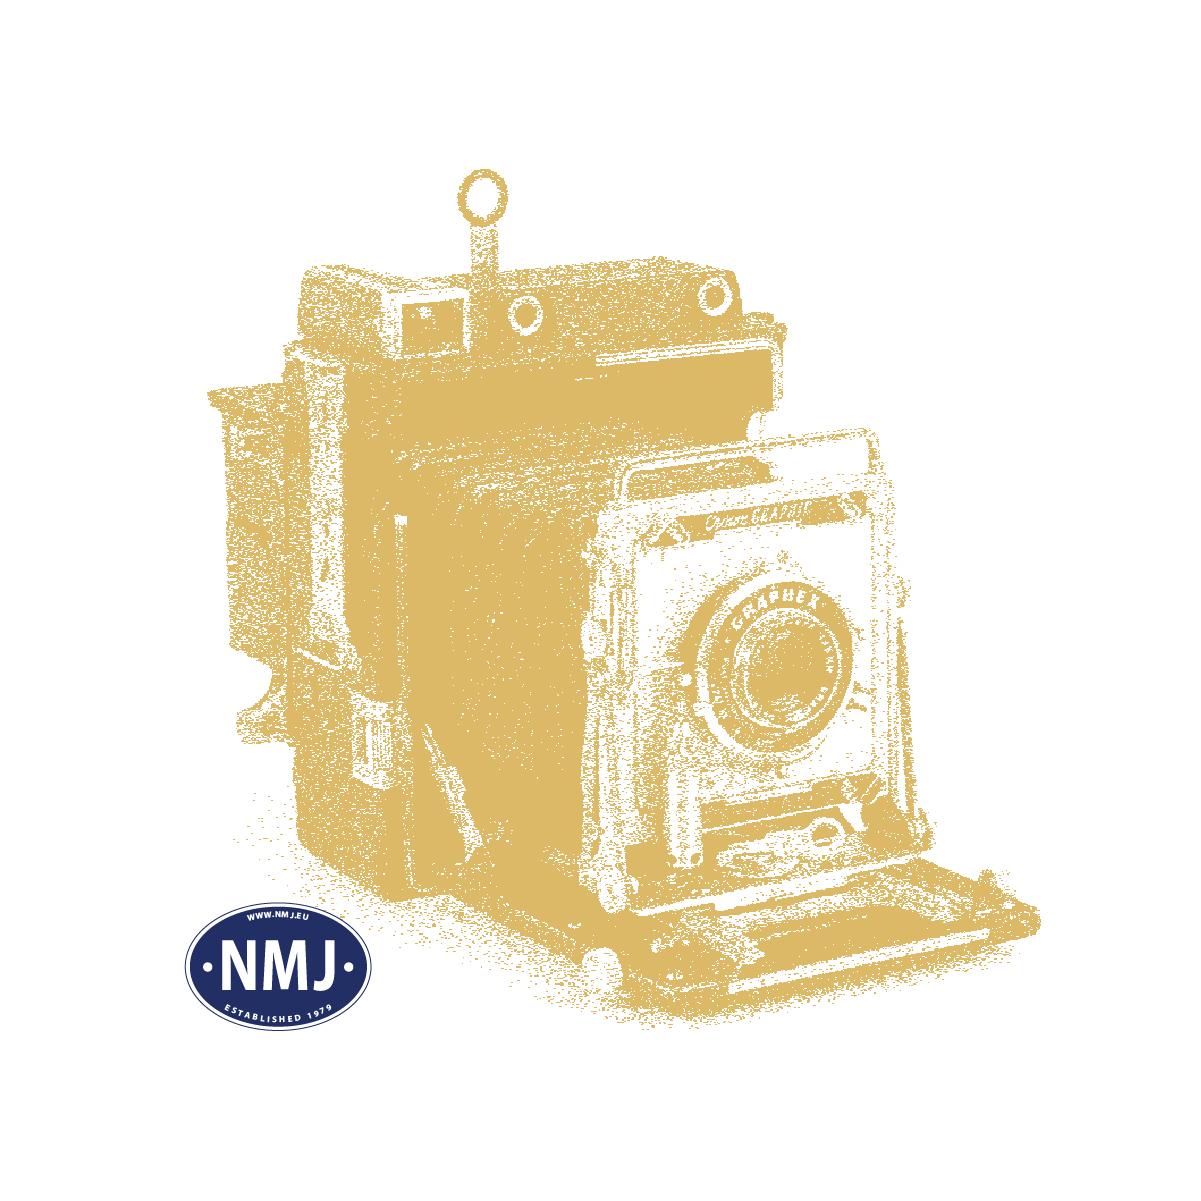 NMJT86.200AC - NMJ Topline NSB El11.2093, rotbraun, AC Digital